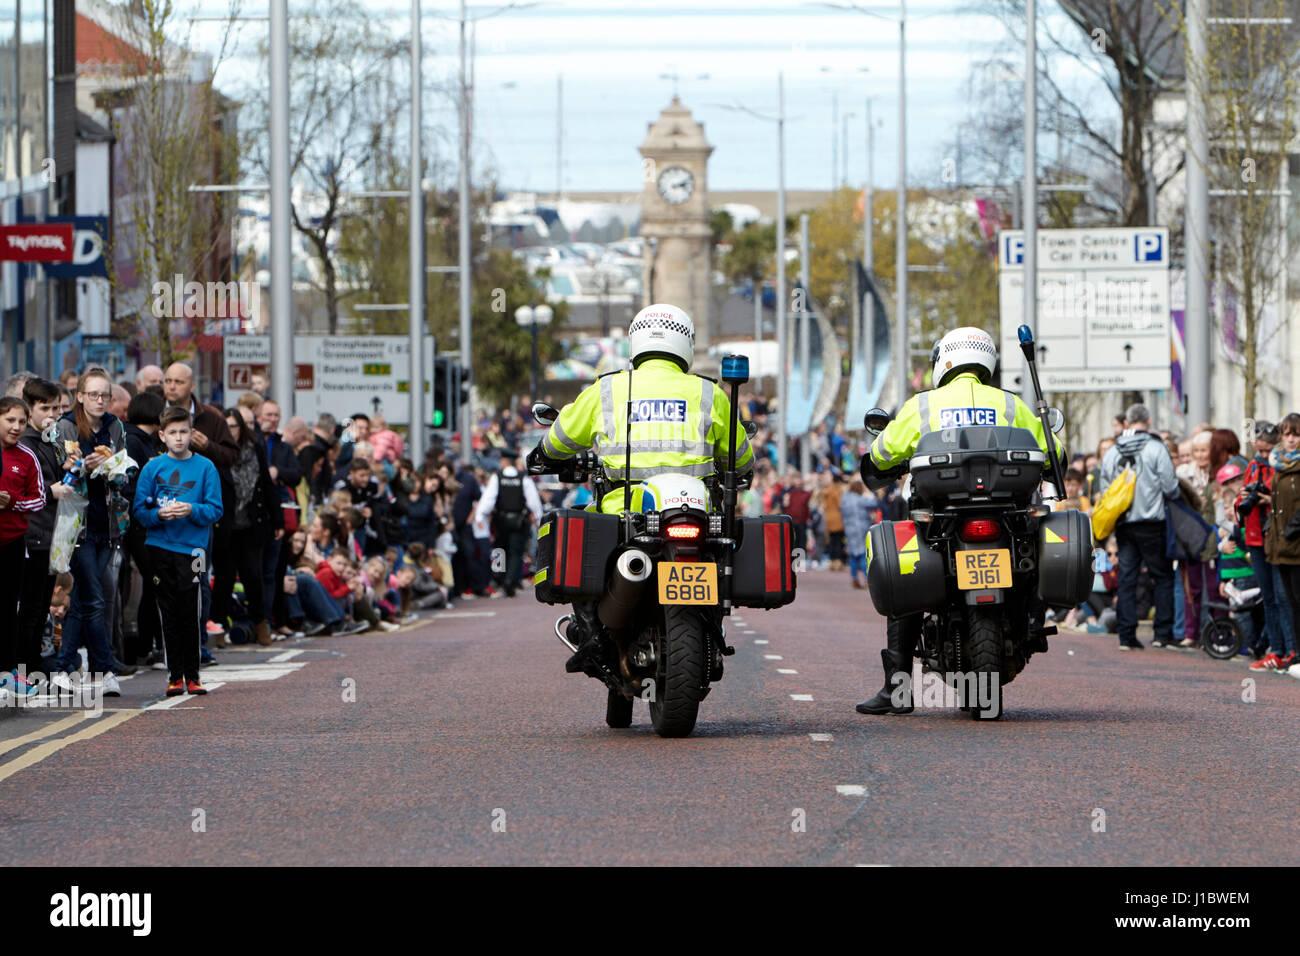 Psni policía policía de tráfico en moto BMW durante un evento turístico desfile en Bangor, Irlanda Imagen De Stock